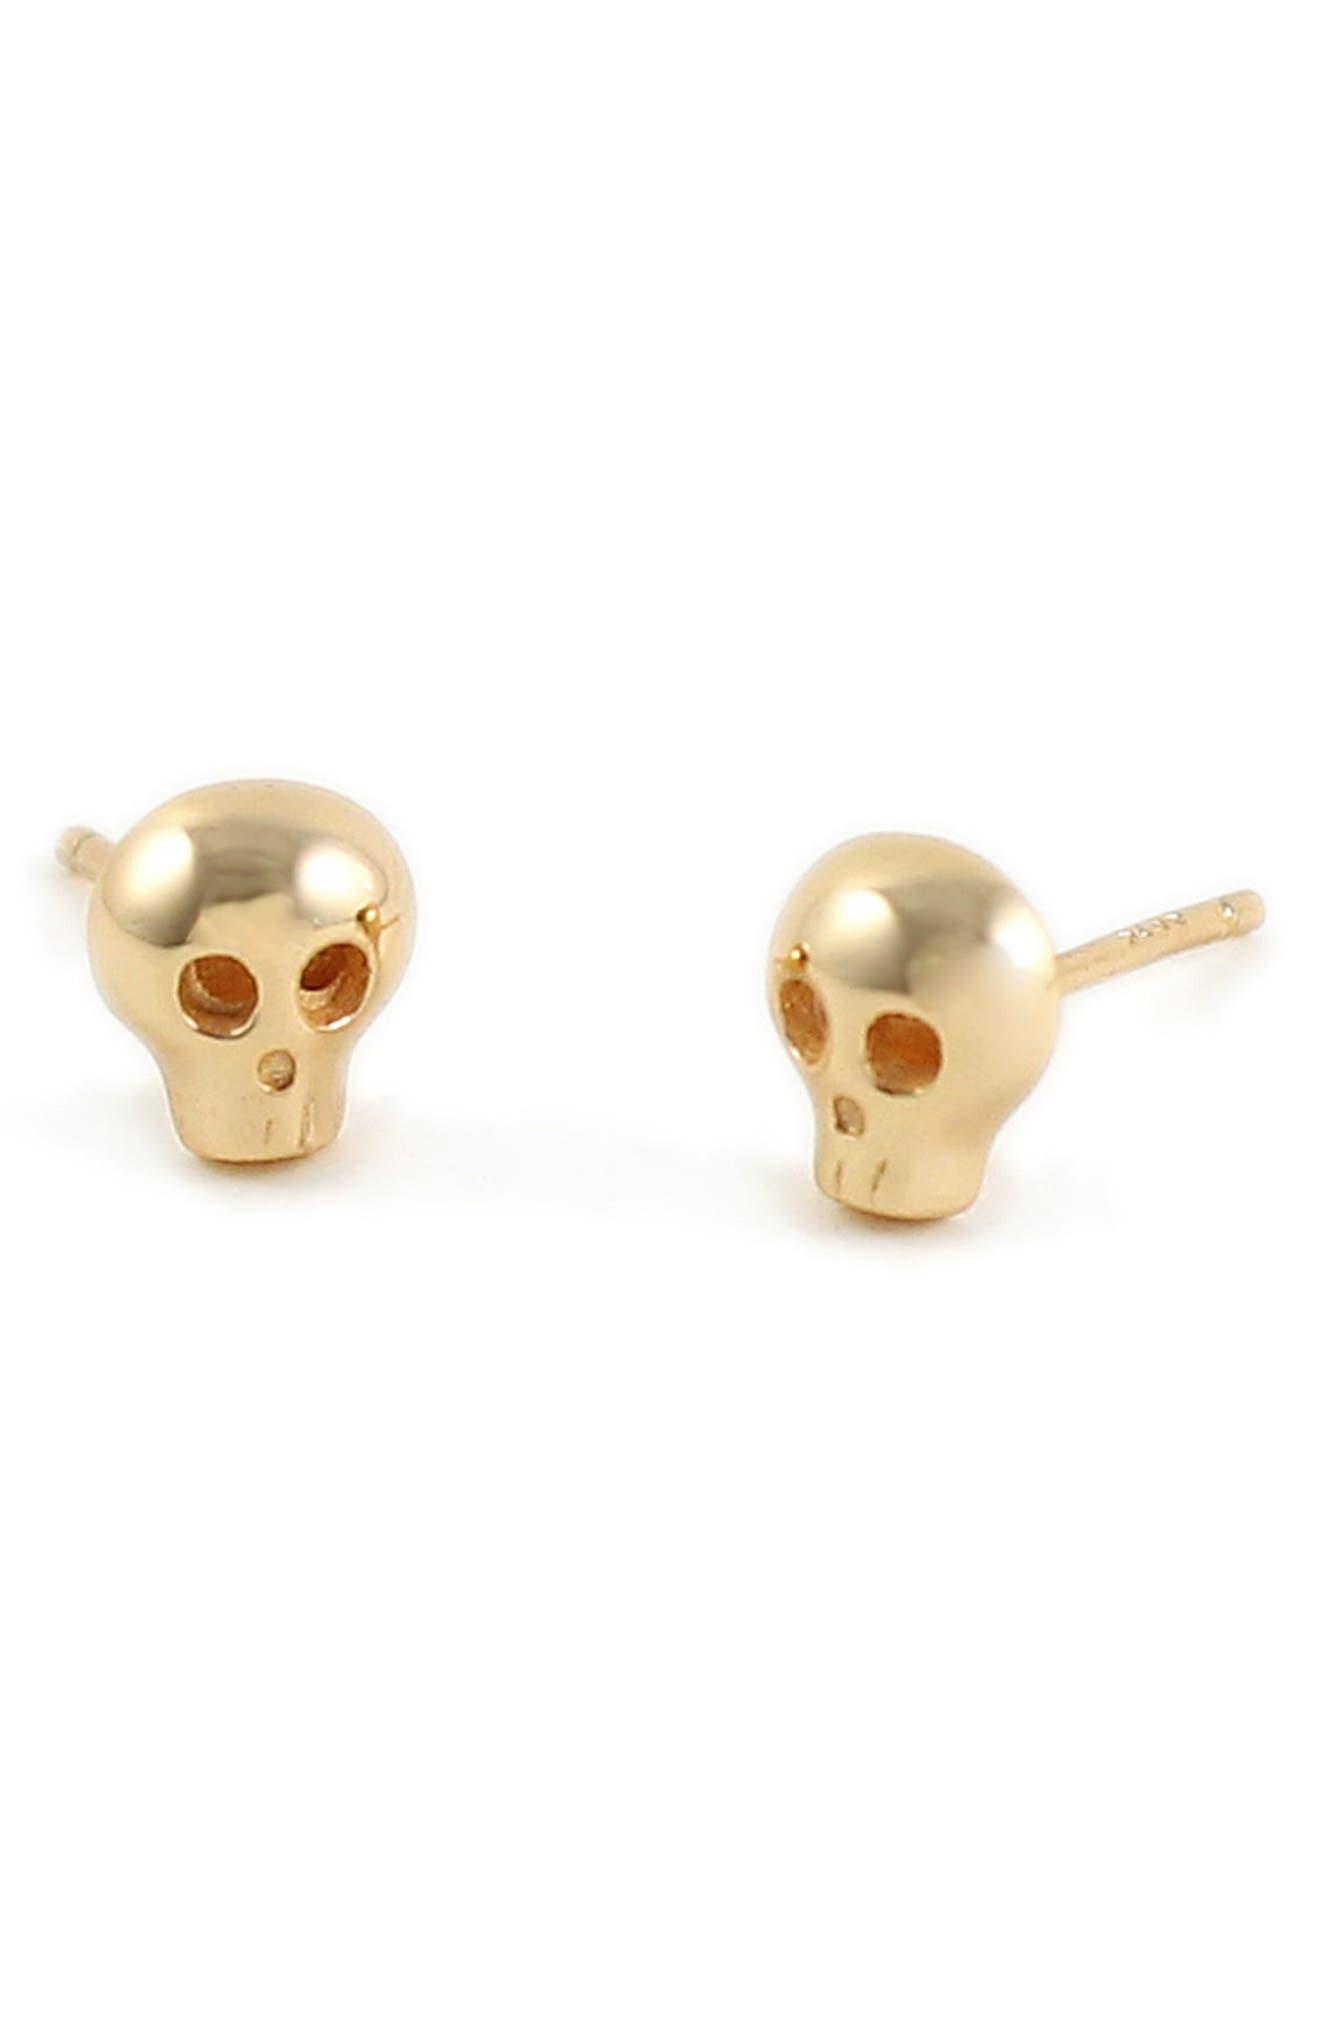 Main Image - Kris Nations Skull Stud Earrings